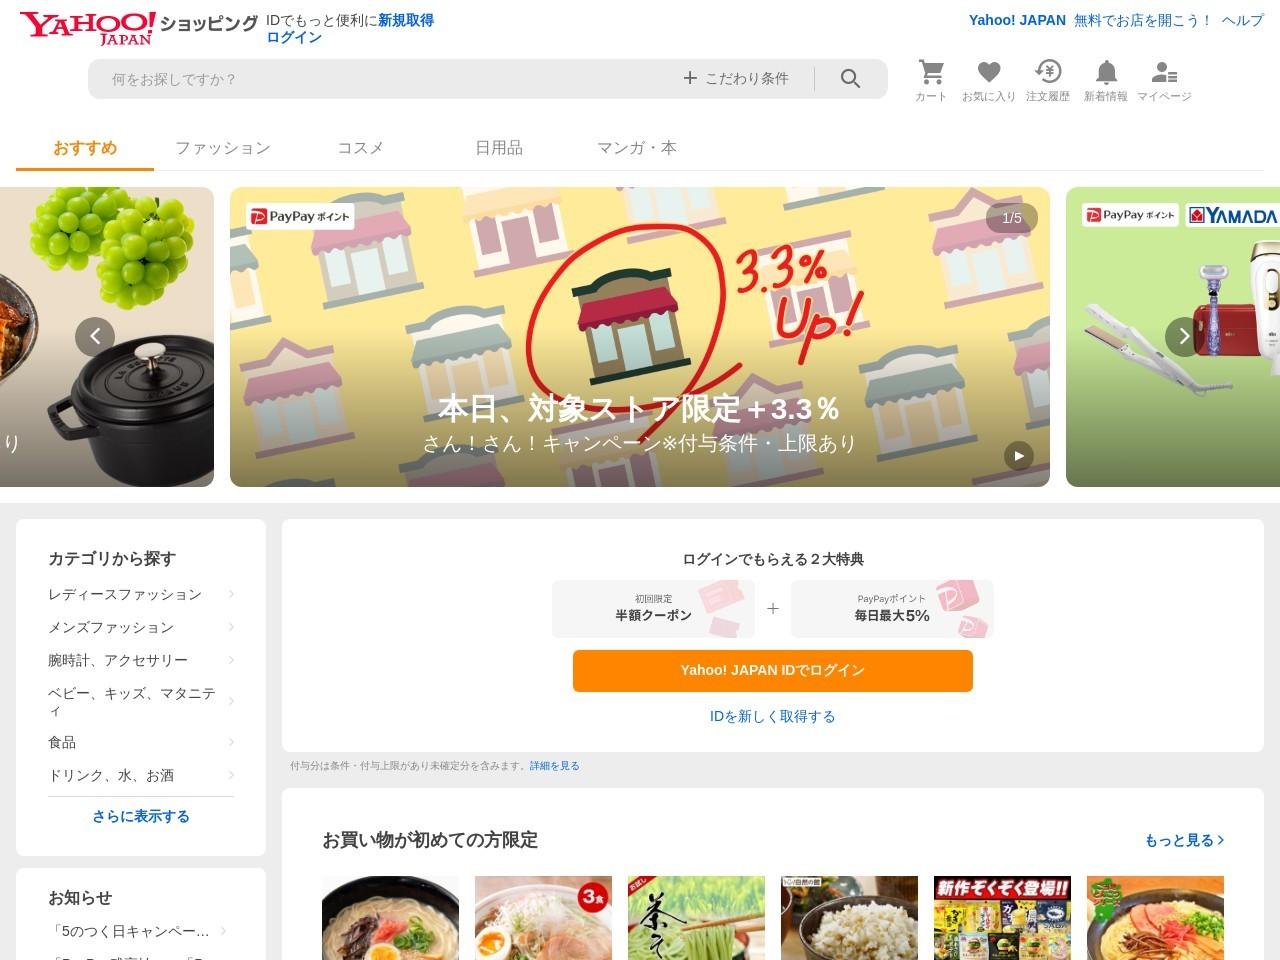 Yahoo!ショッピング – 旅行用品 ランキングTOP20